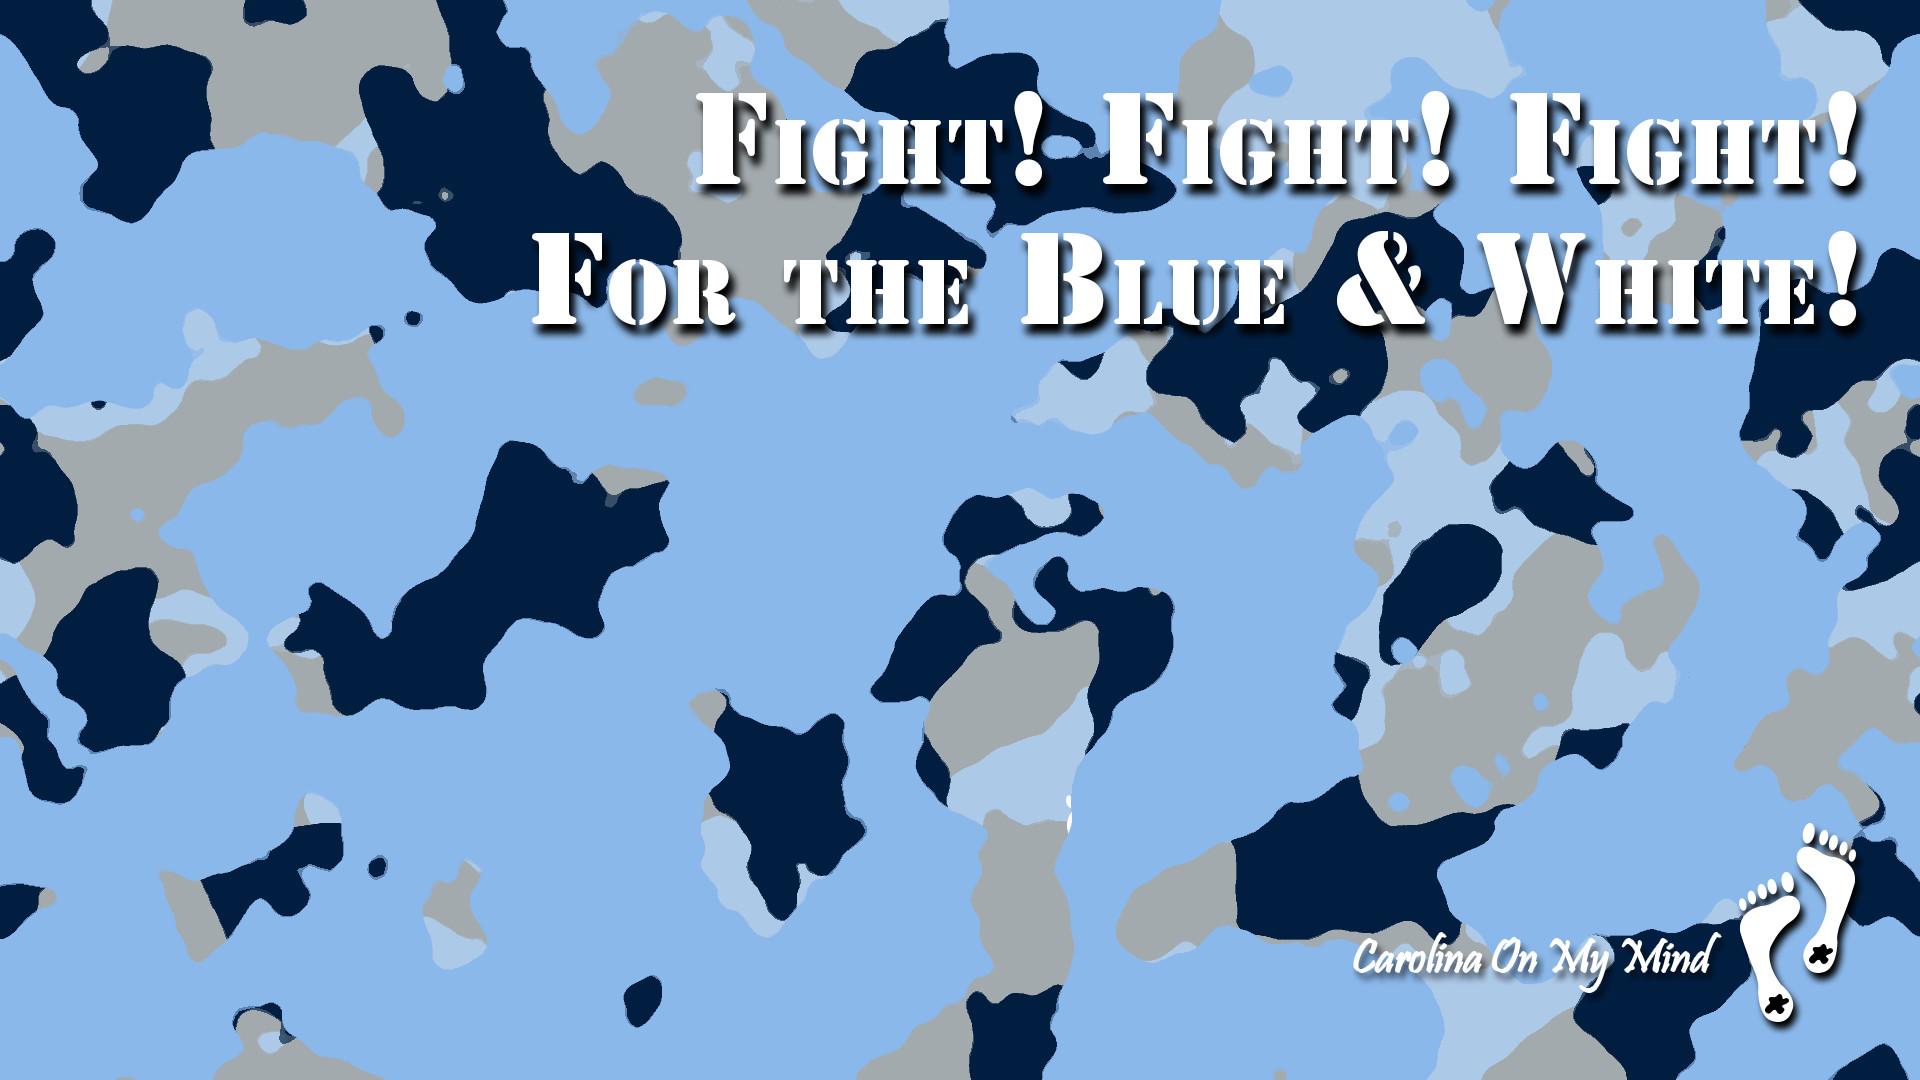 Fight Fight Fight Camo UNC Desktop Wallpaper 1920 x 1080